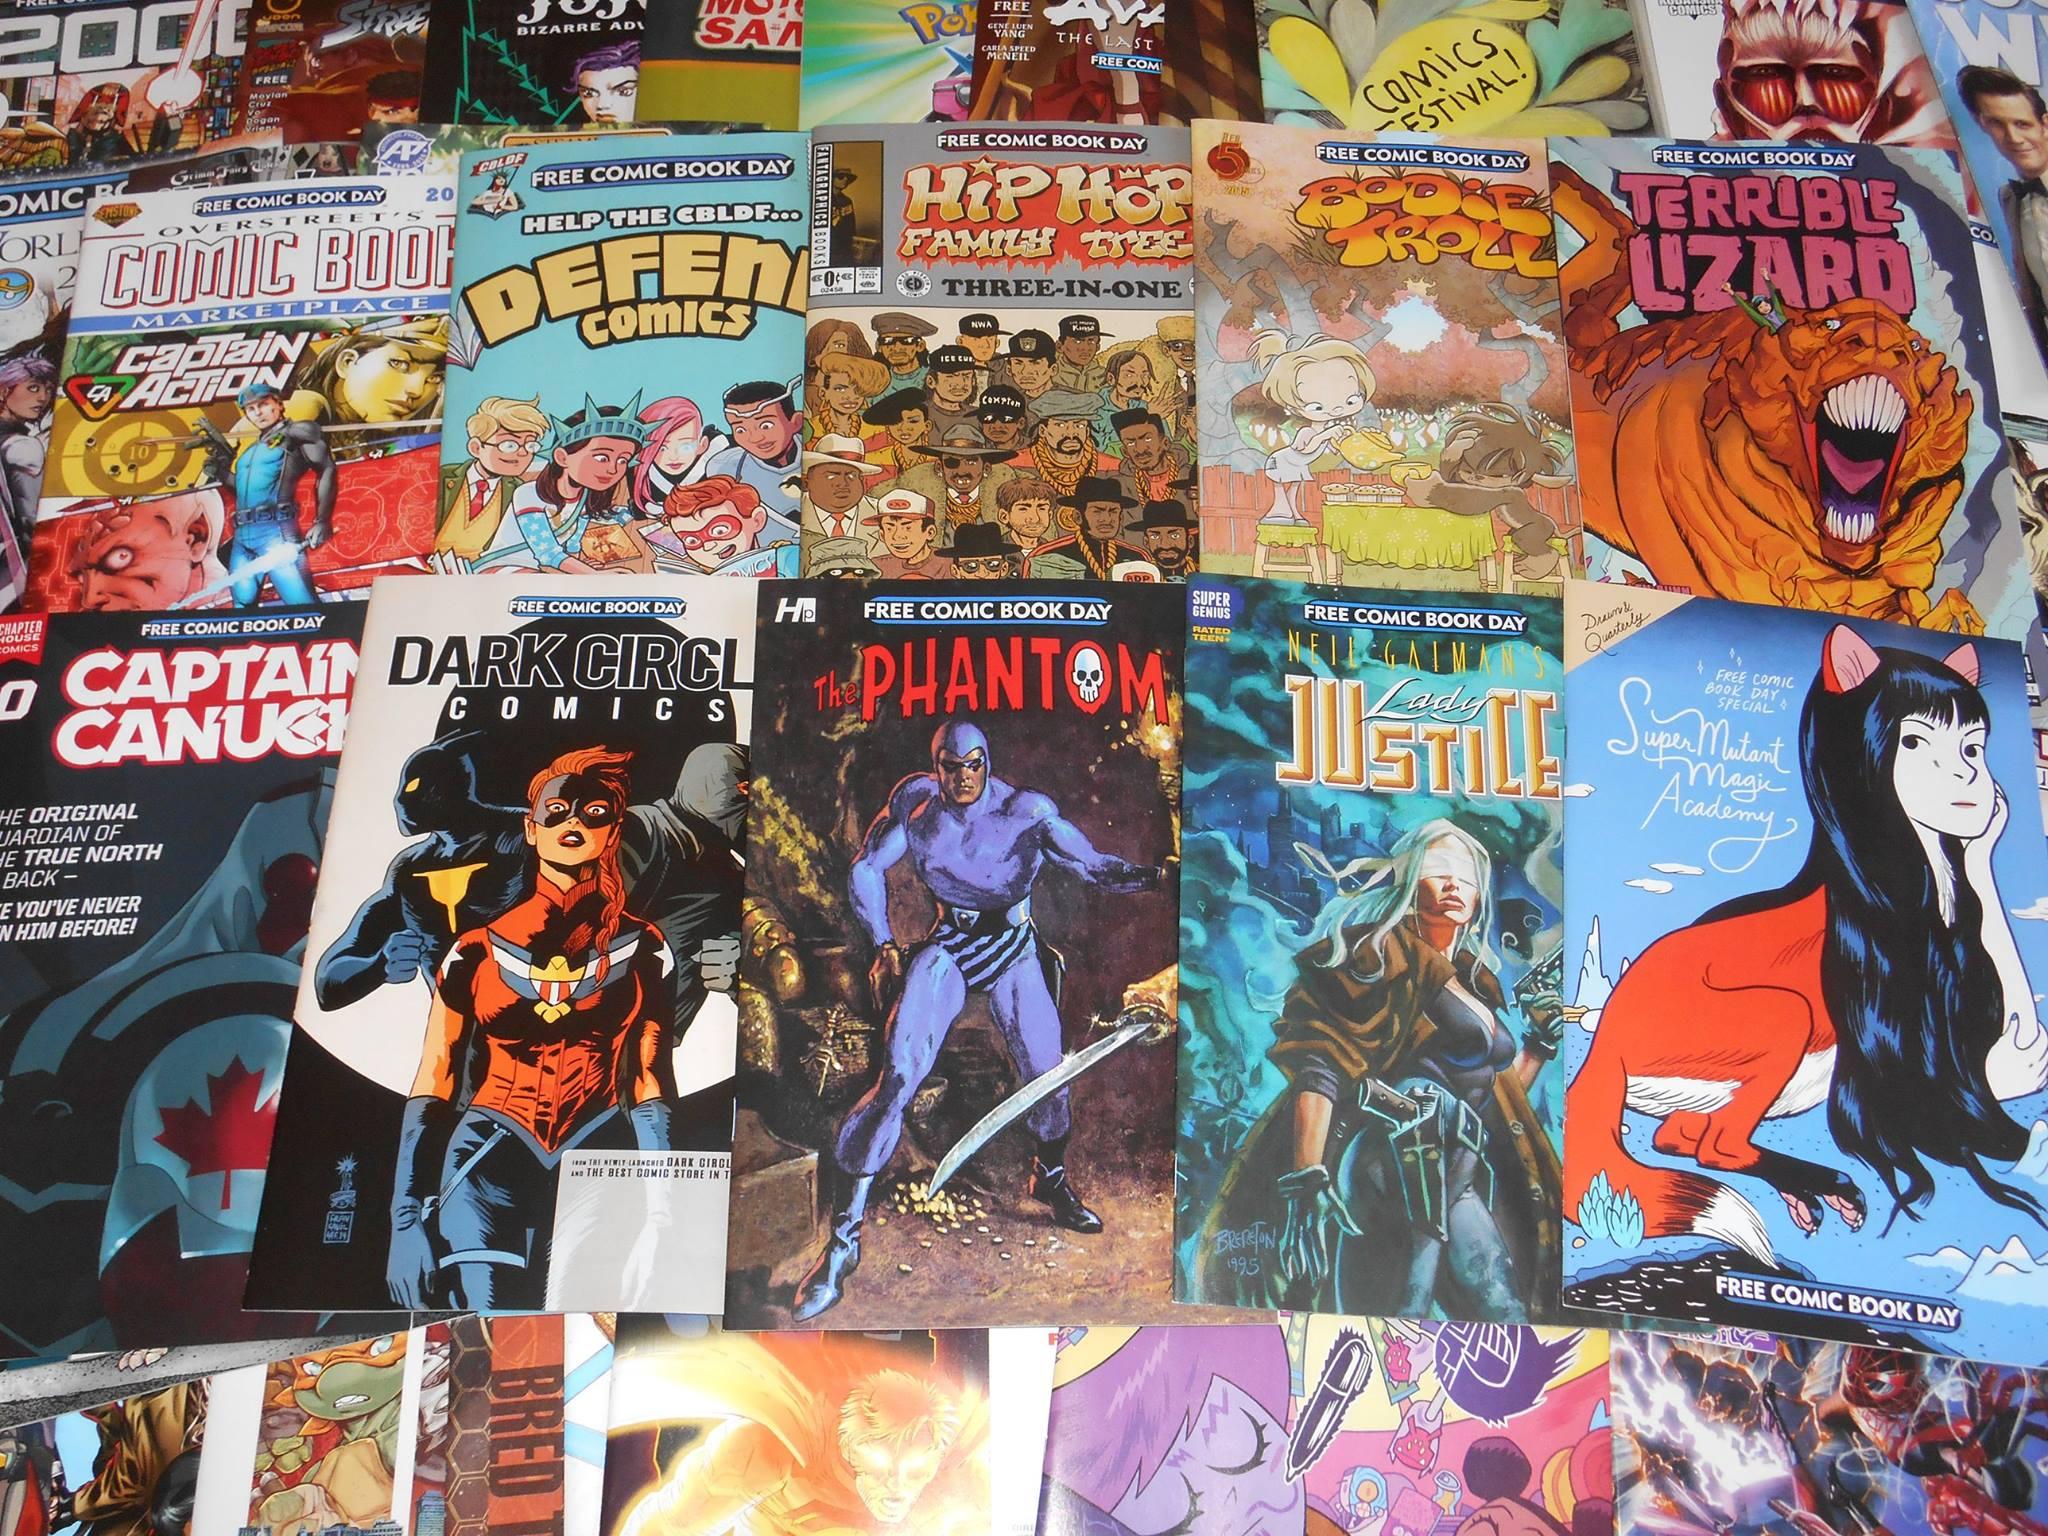 free comic book day - the phantom